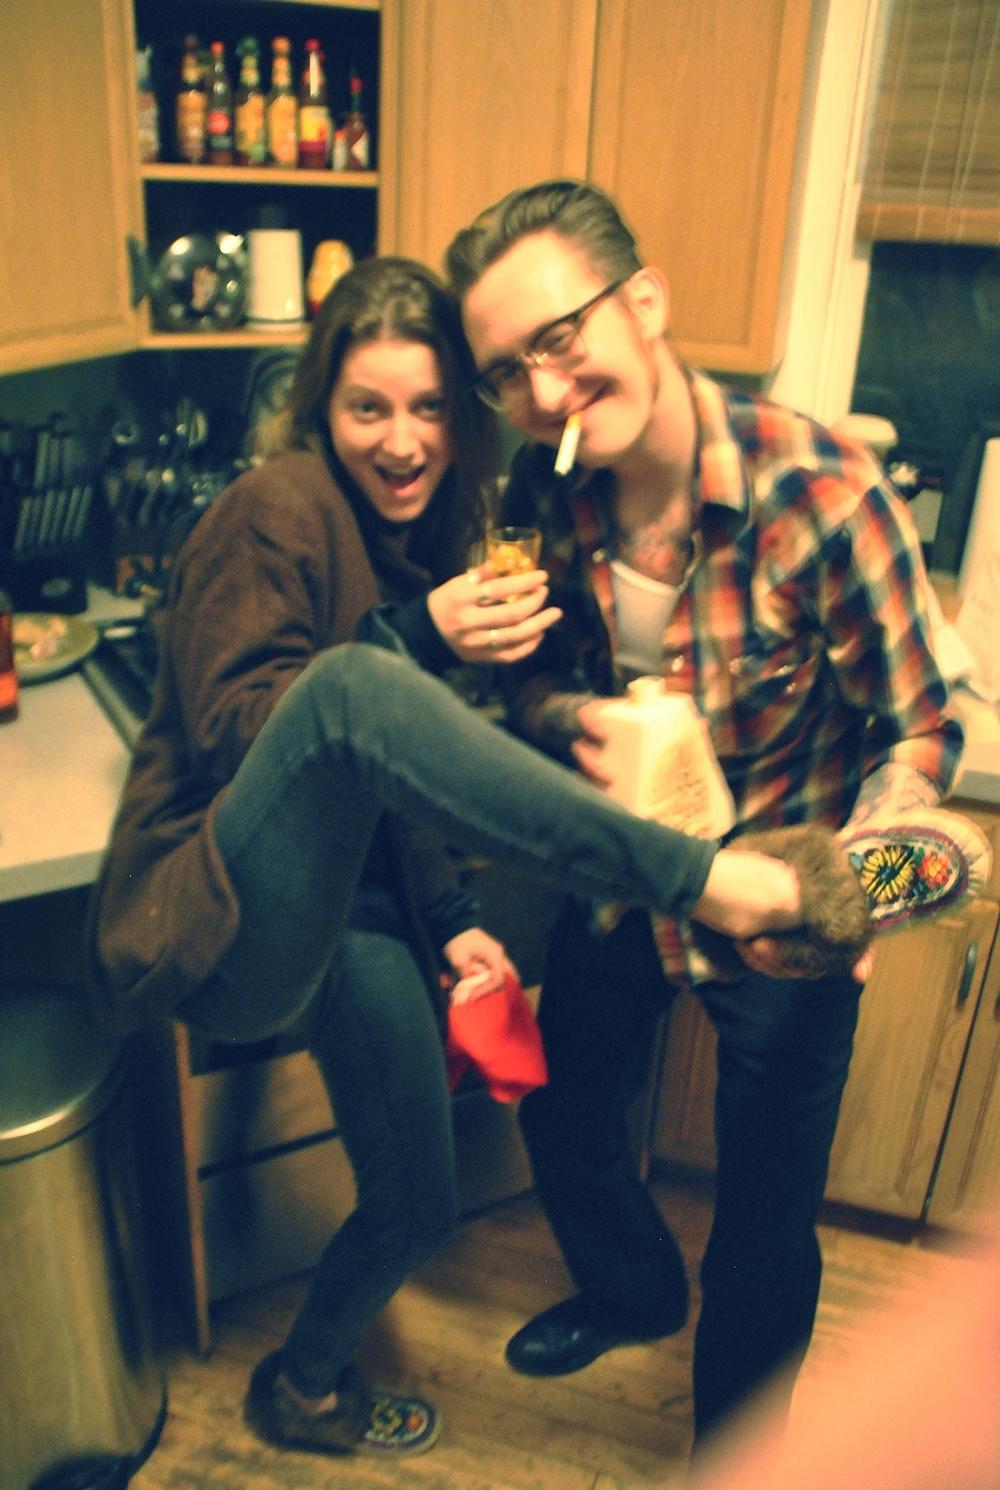 sharing fancy booze + moccasins = HOSPITALITY!